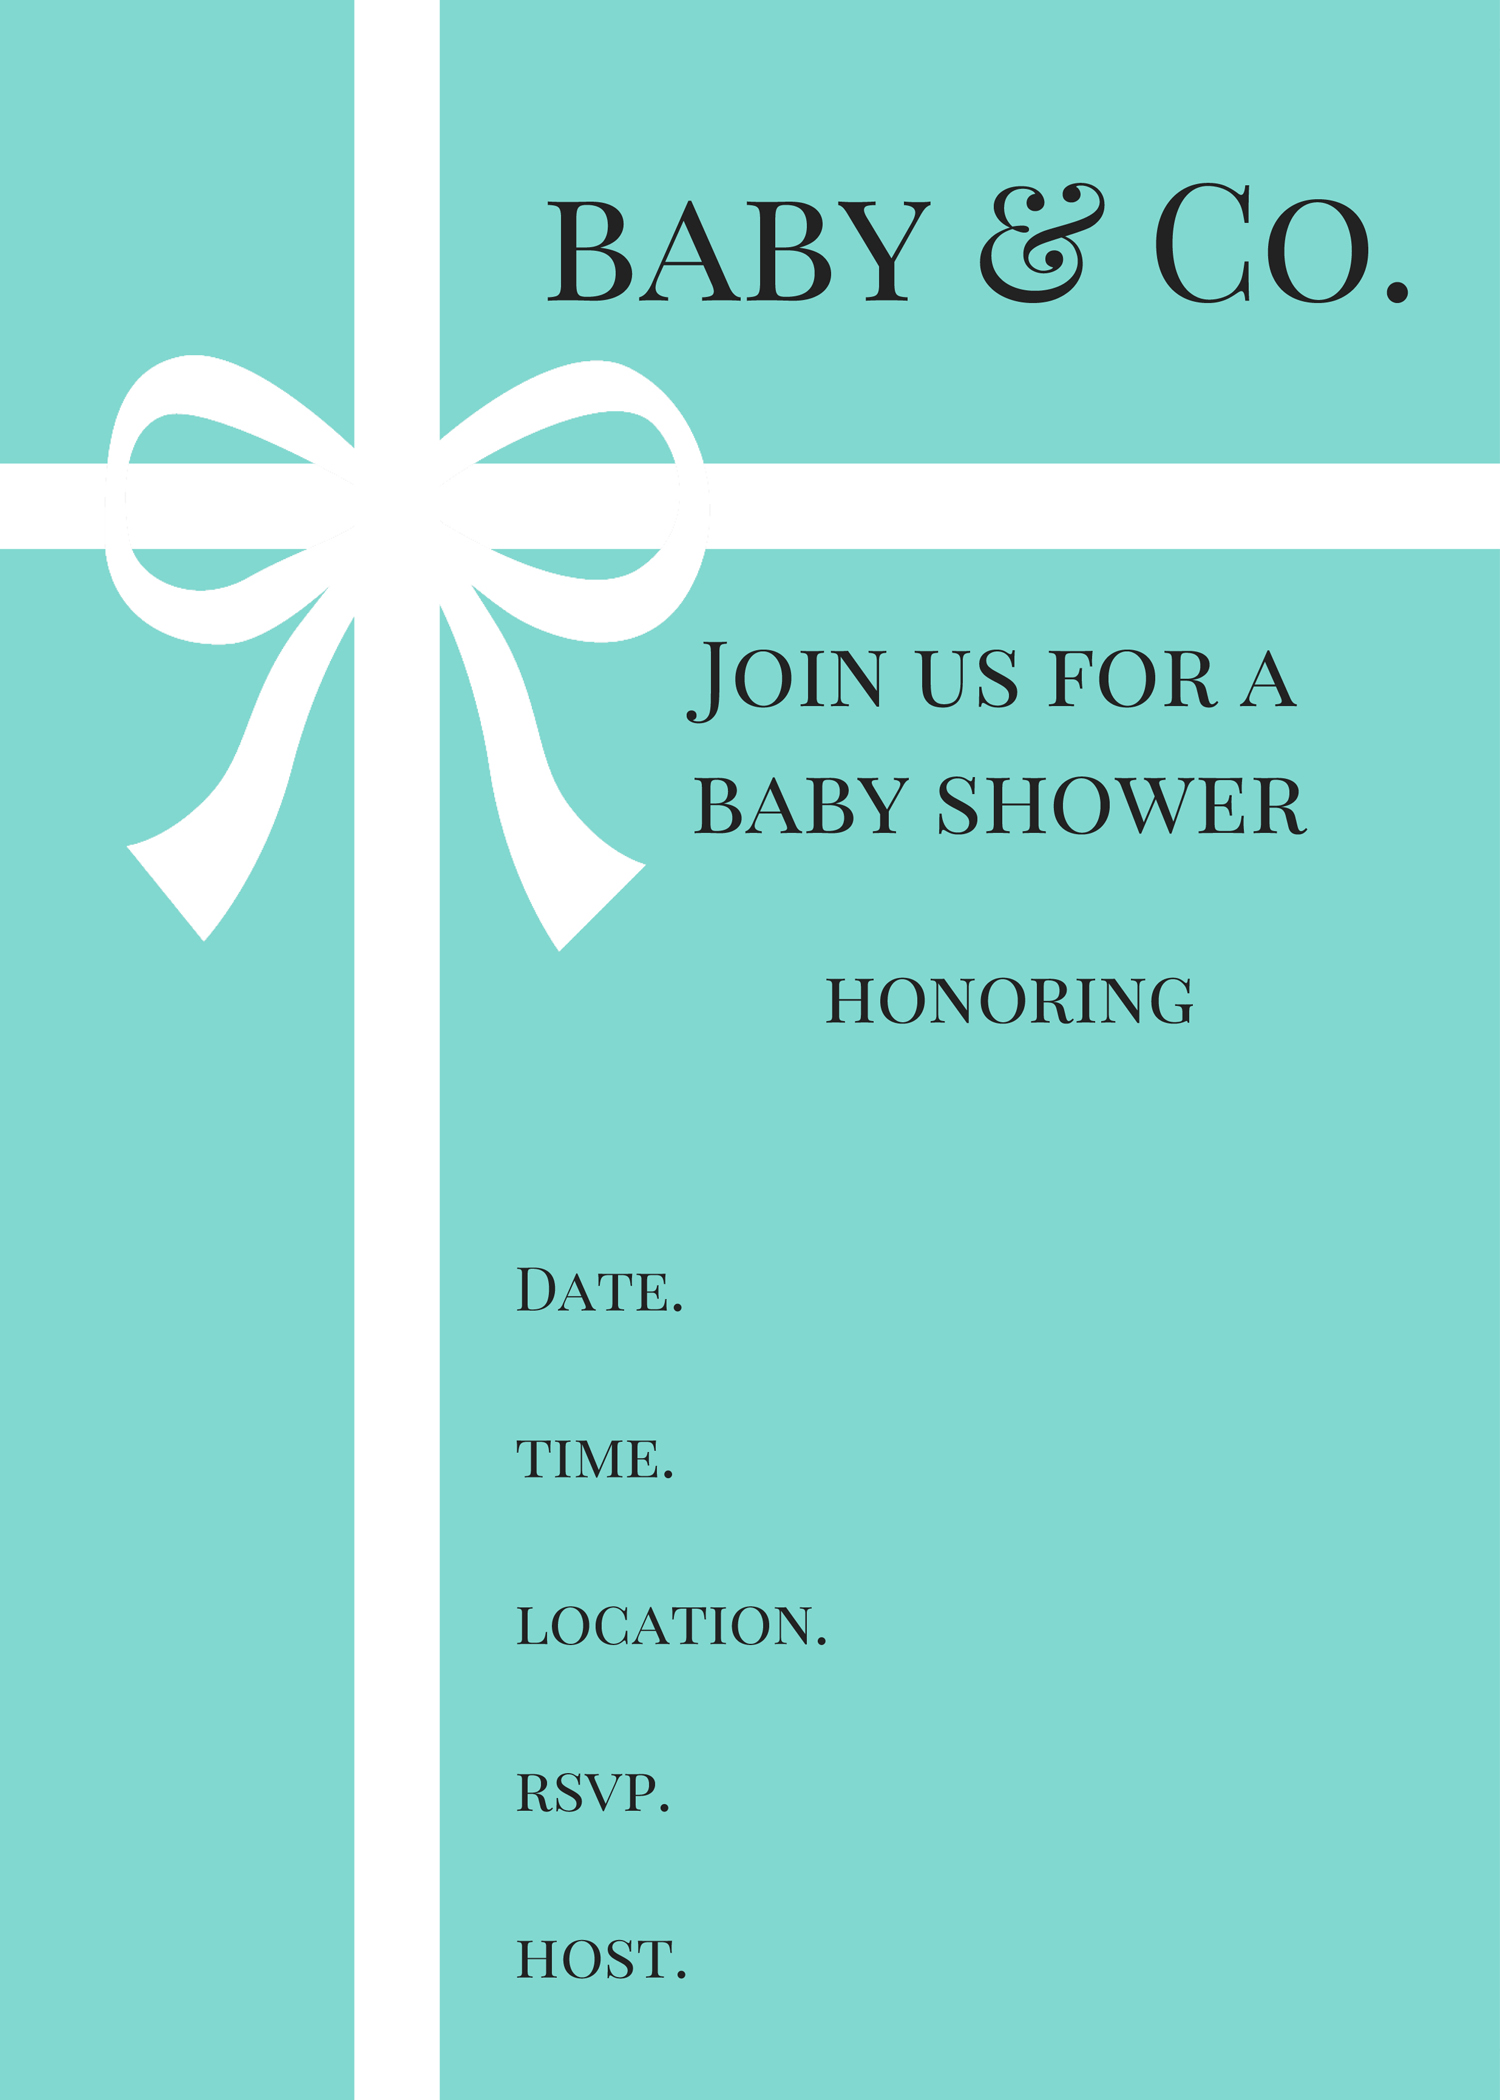 Baby Shower Invitation Backgrounds Free Baby Shower Invitations Boycreatephotocards4U On Etsy $15.00 .